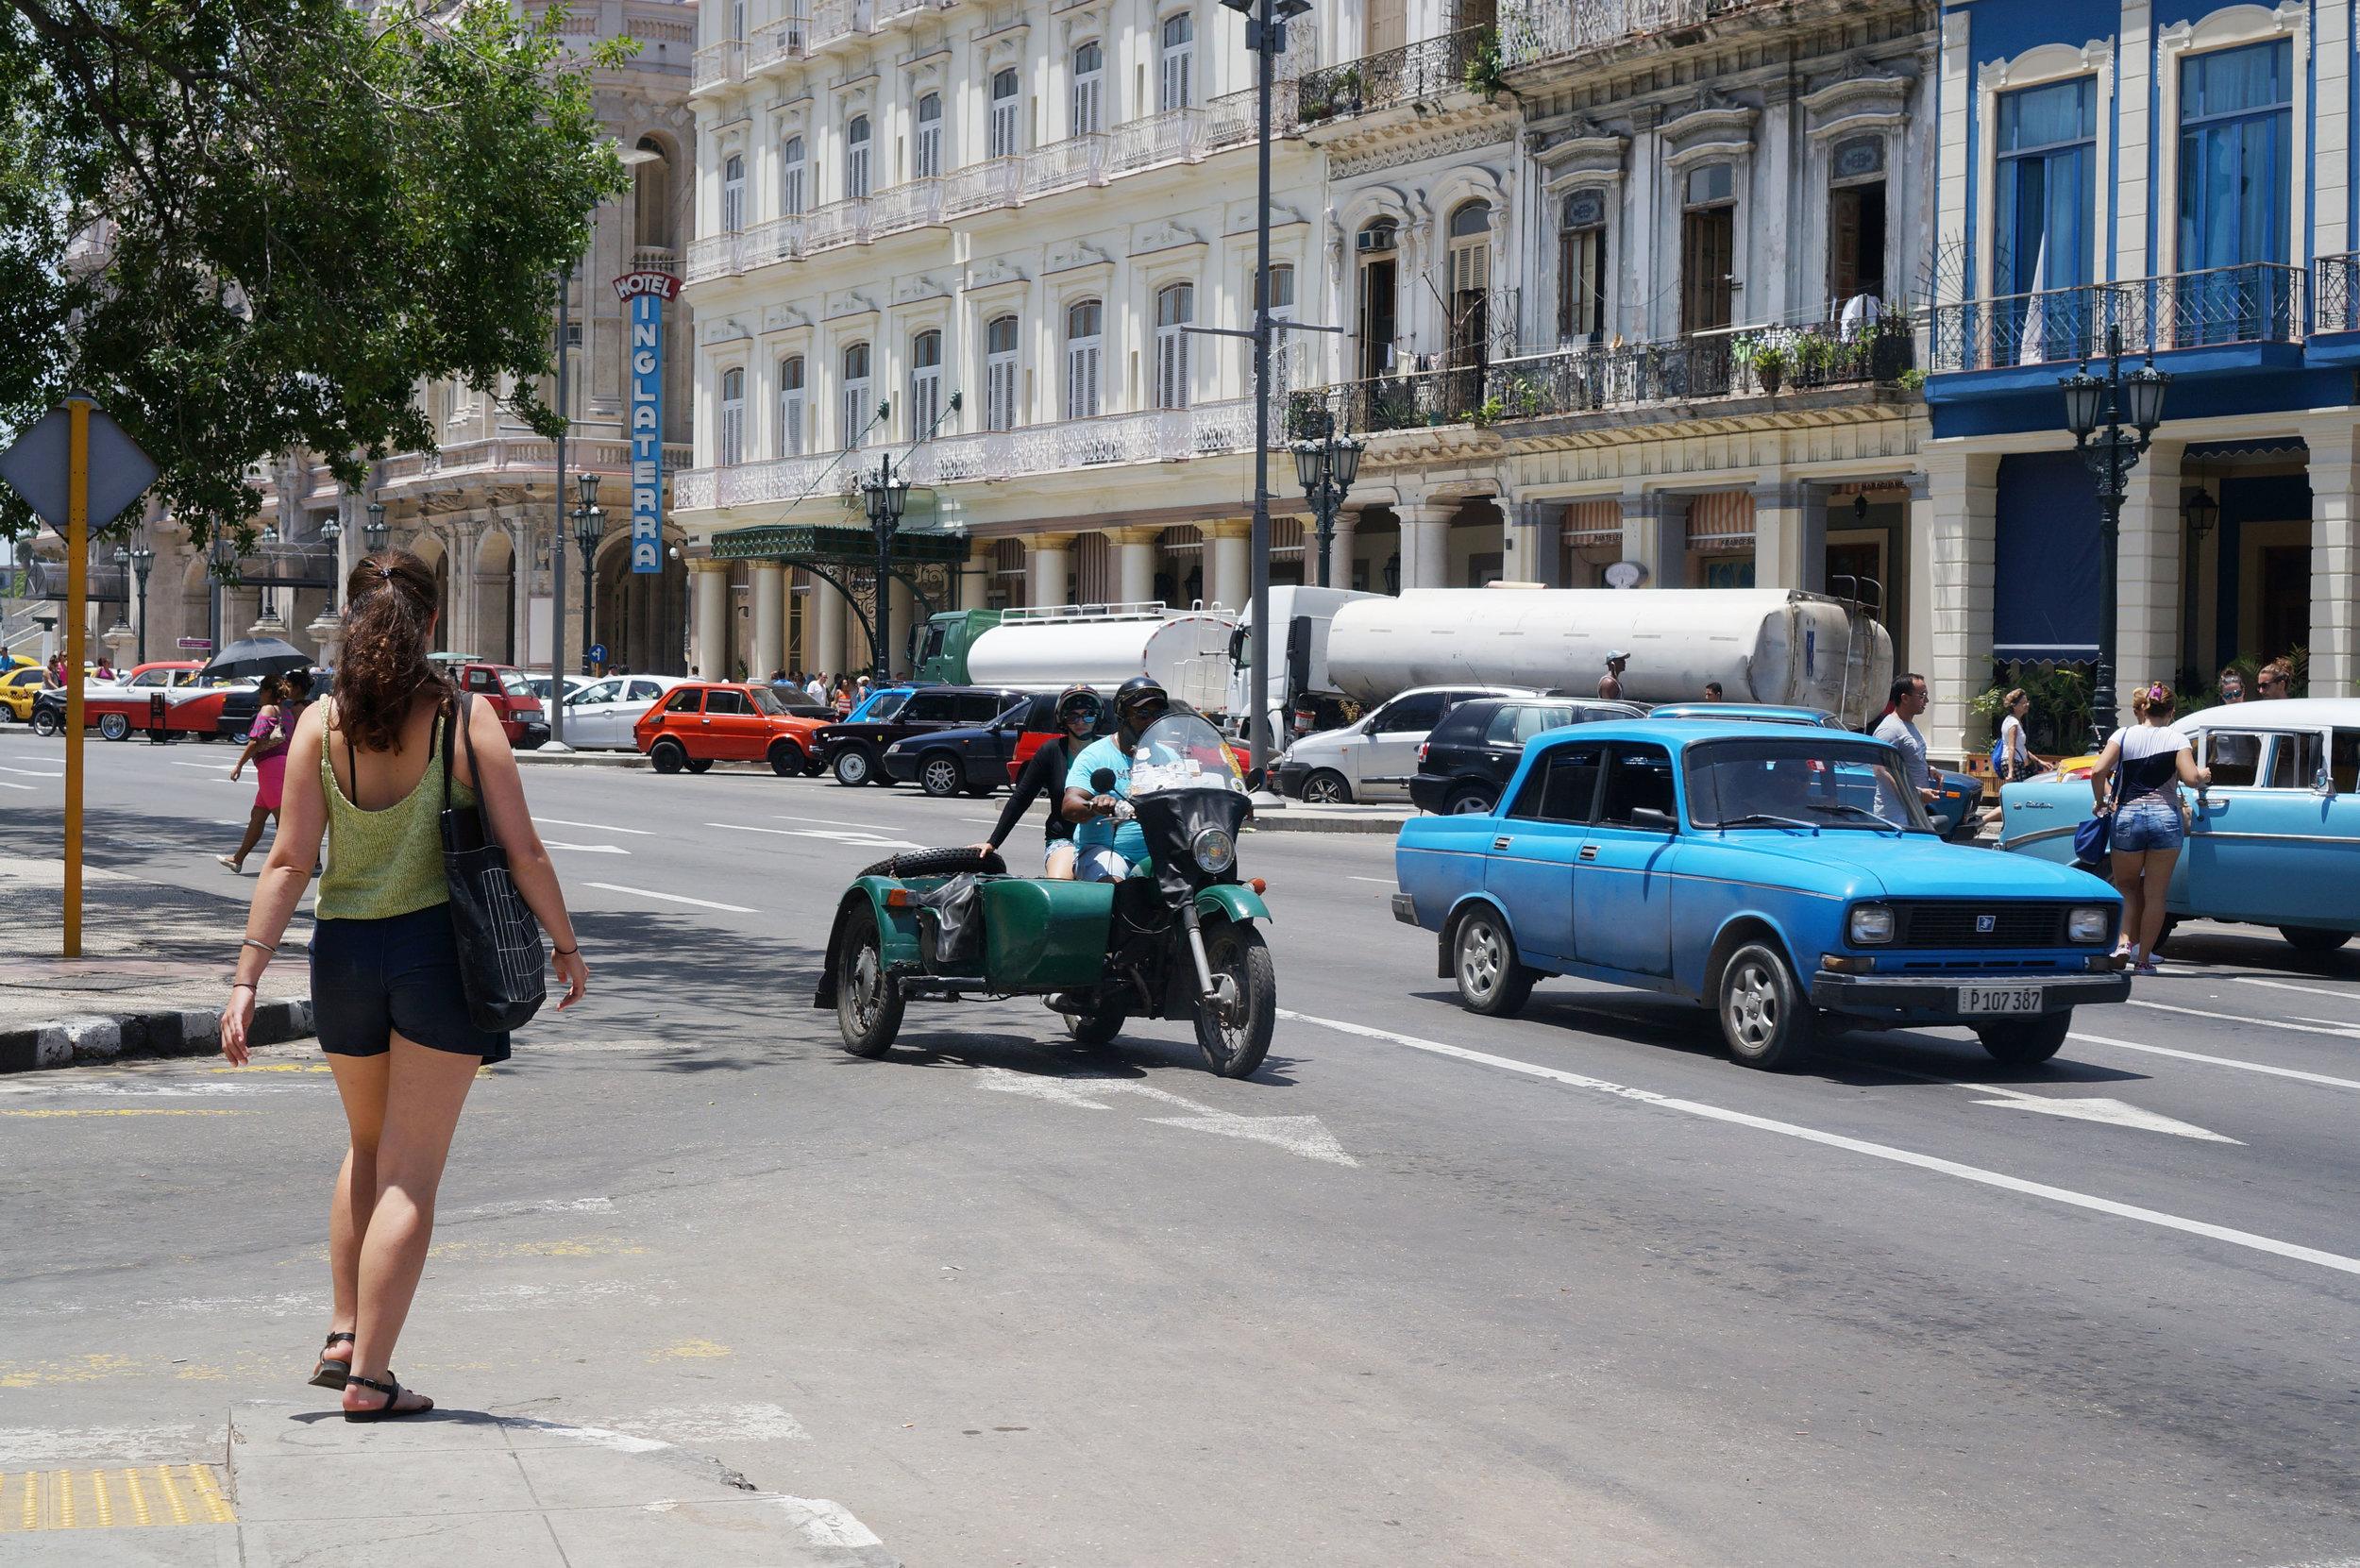 Driving along side the Prado